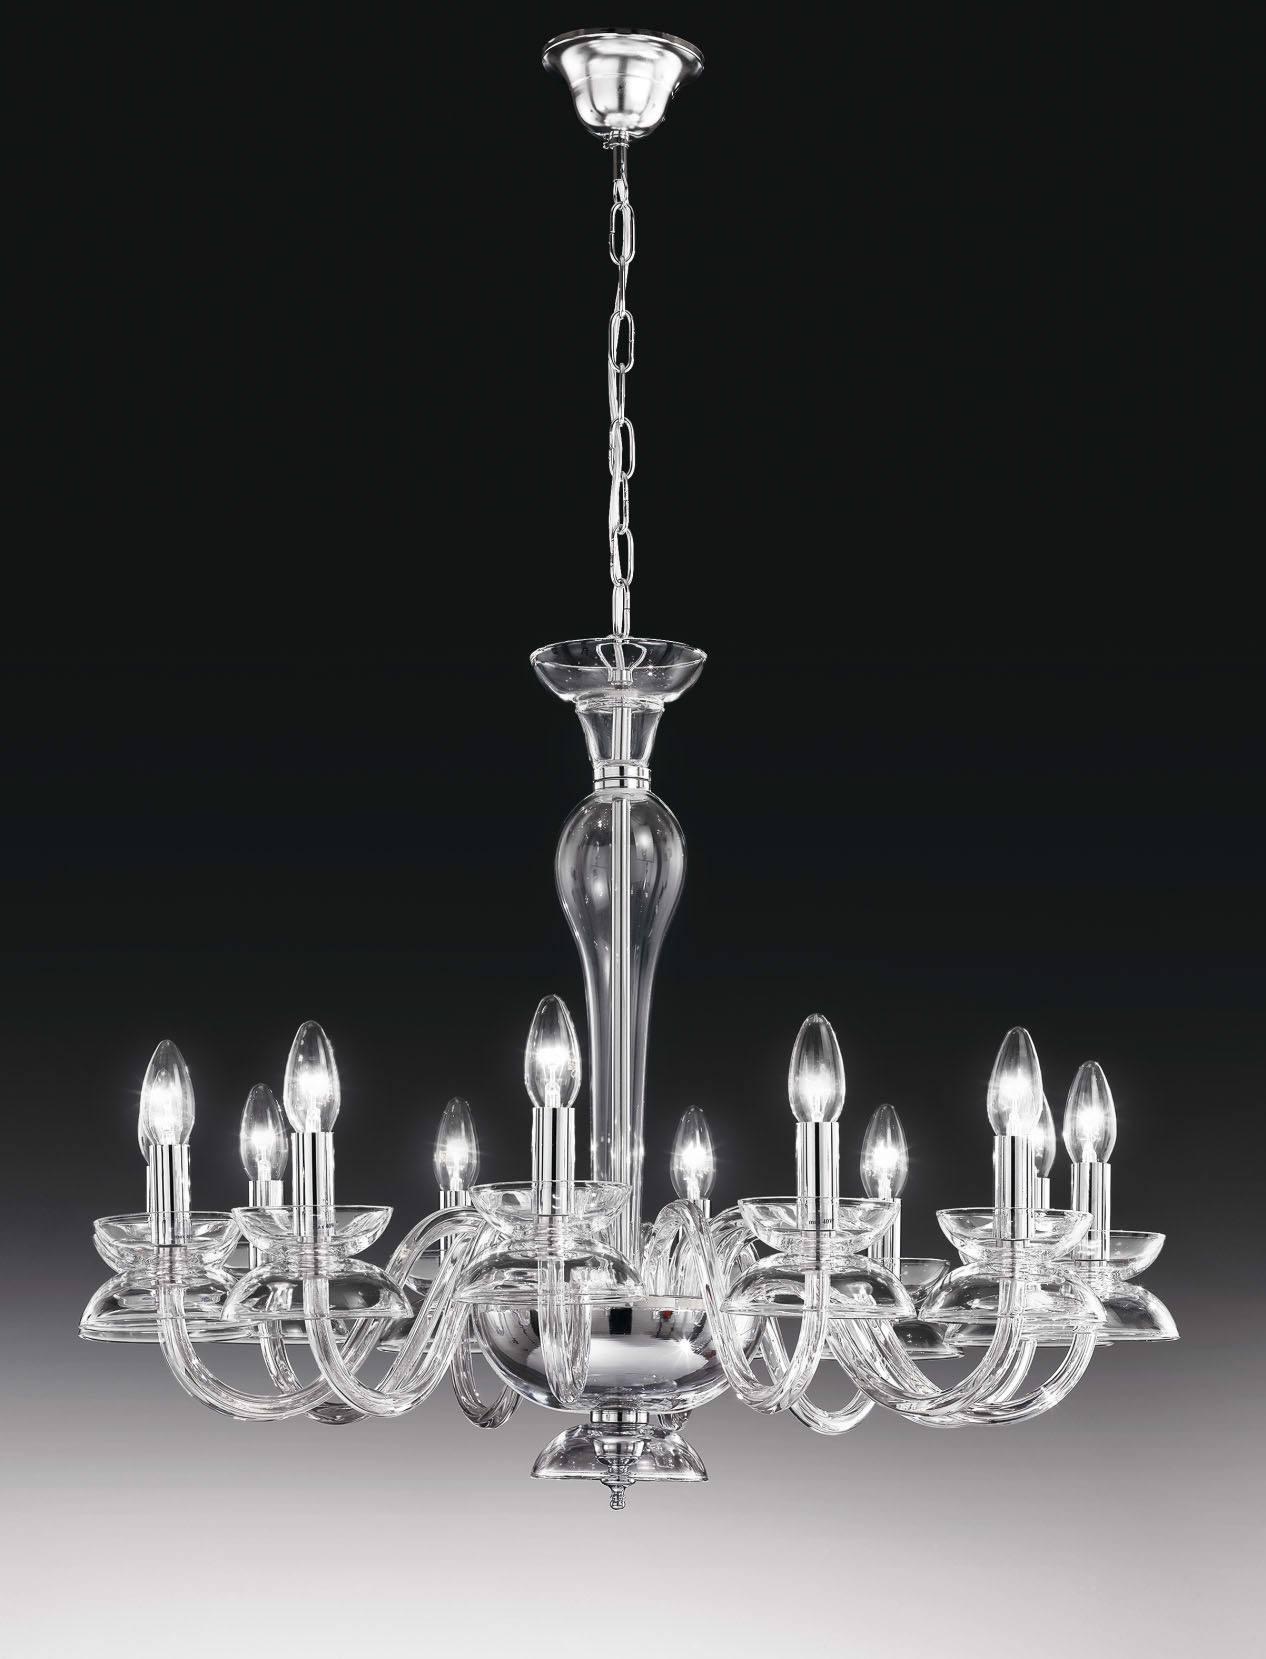 DalÍ 12l Crystal Chandelier By Voltolina Chandeliers Indoor Lighting Platinlux Italian Design At Top S